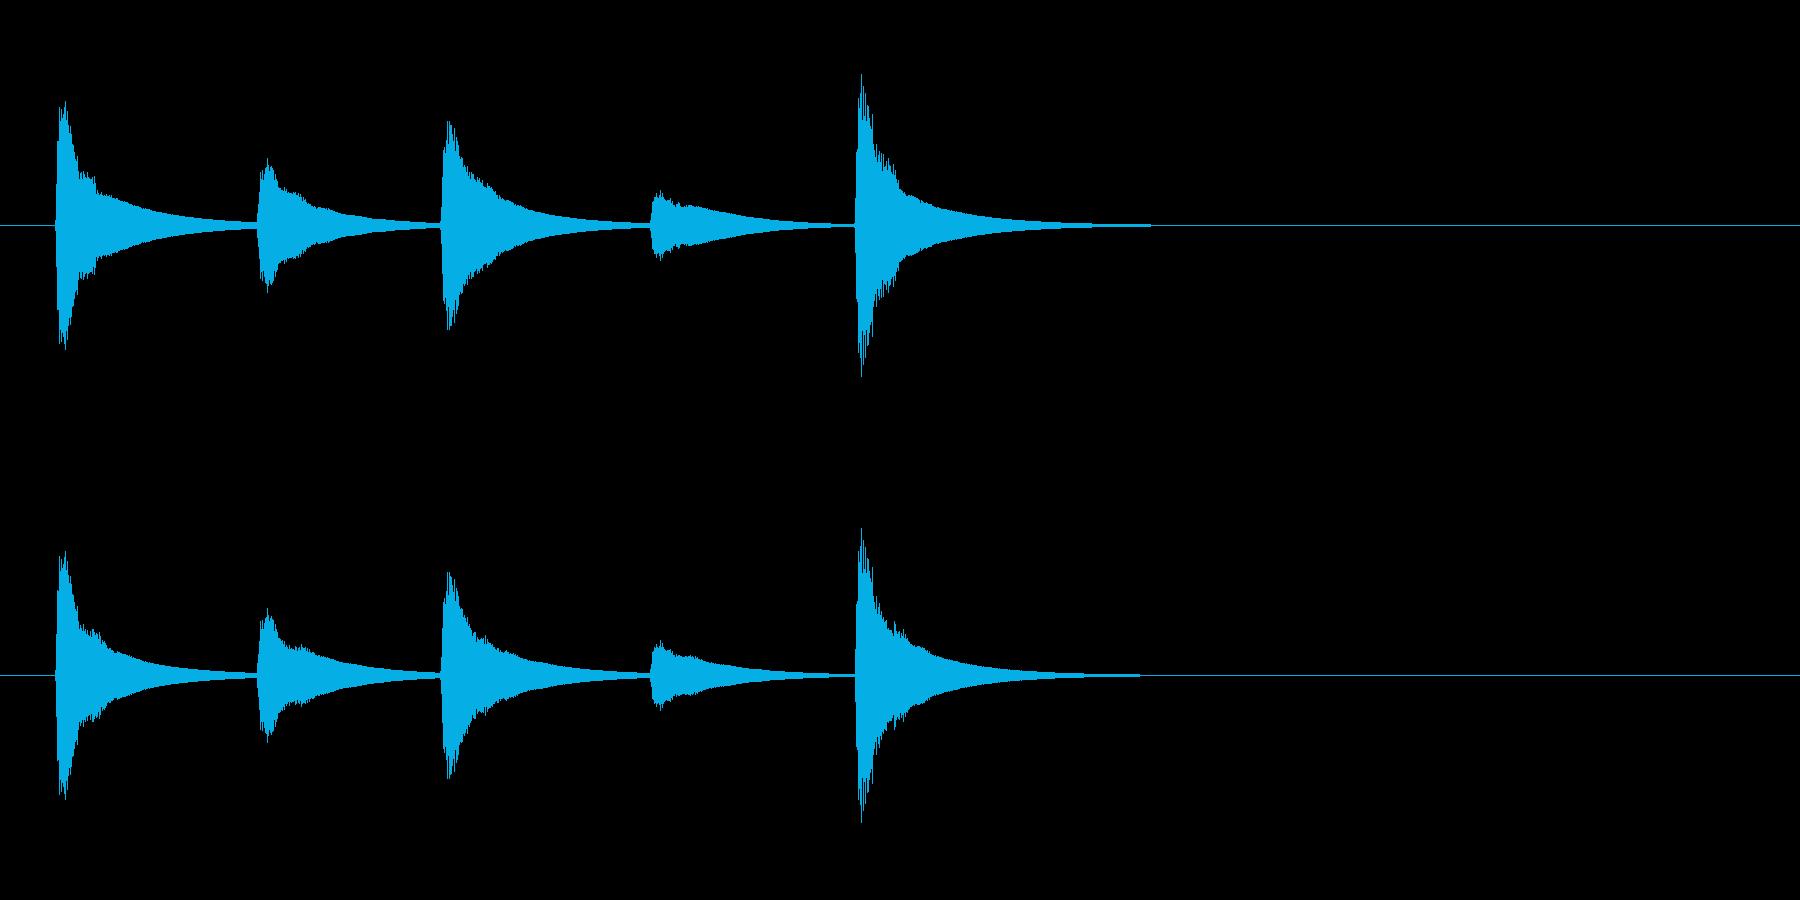 【SE 効果音】ティロティリロリン7の再生済みの波形